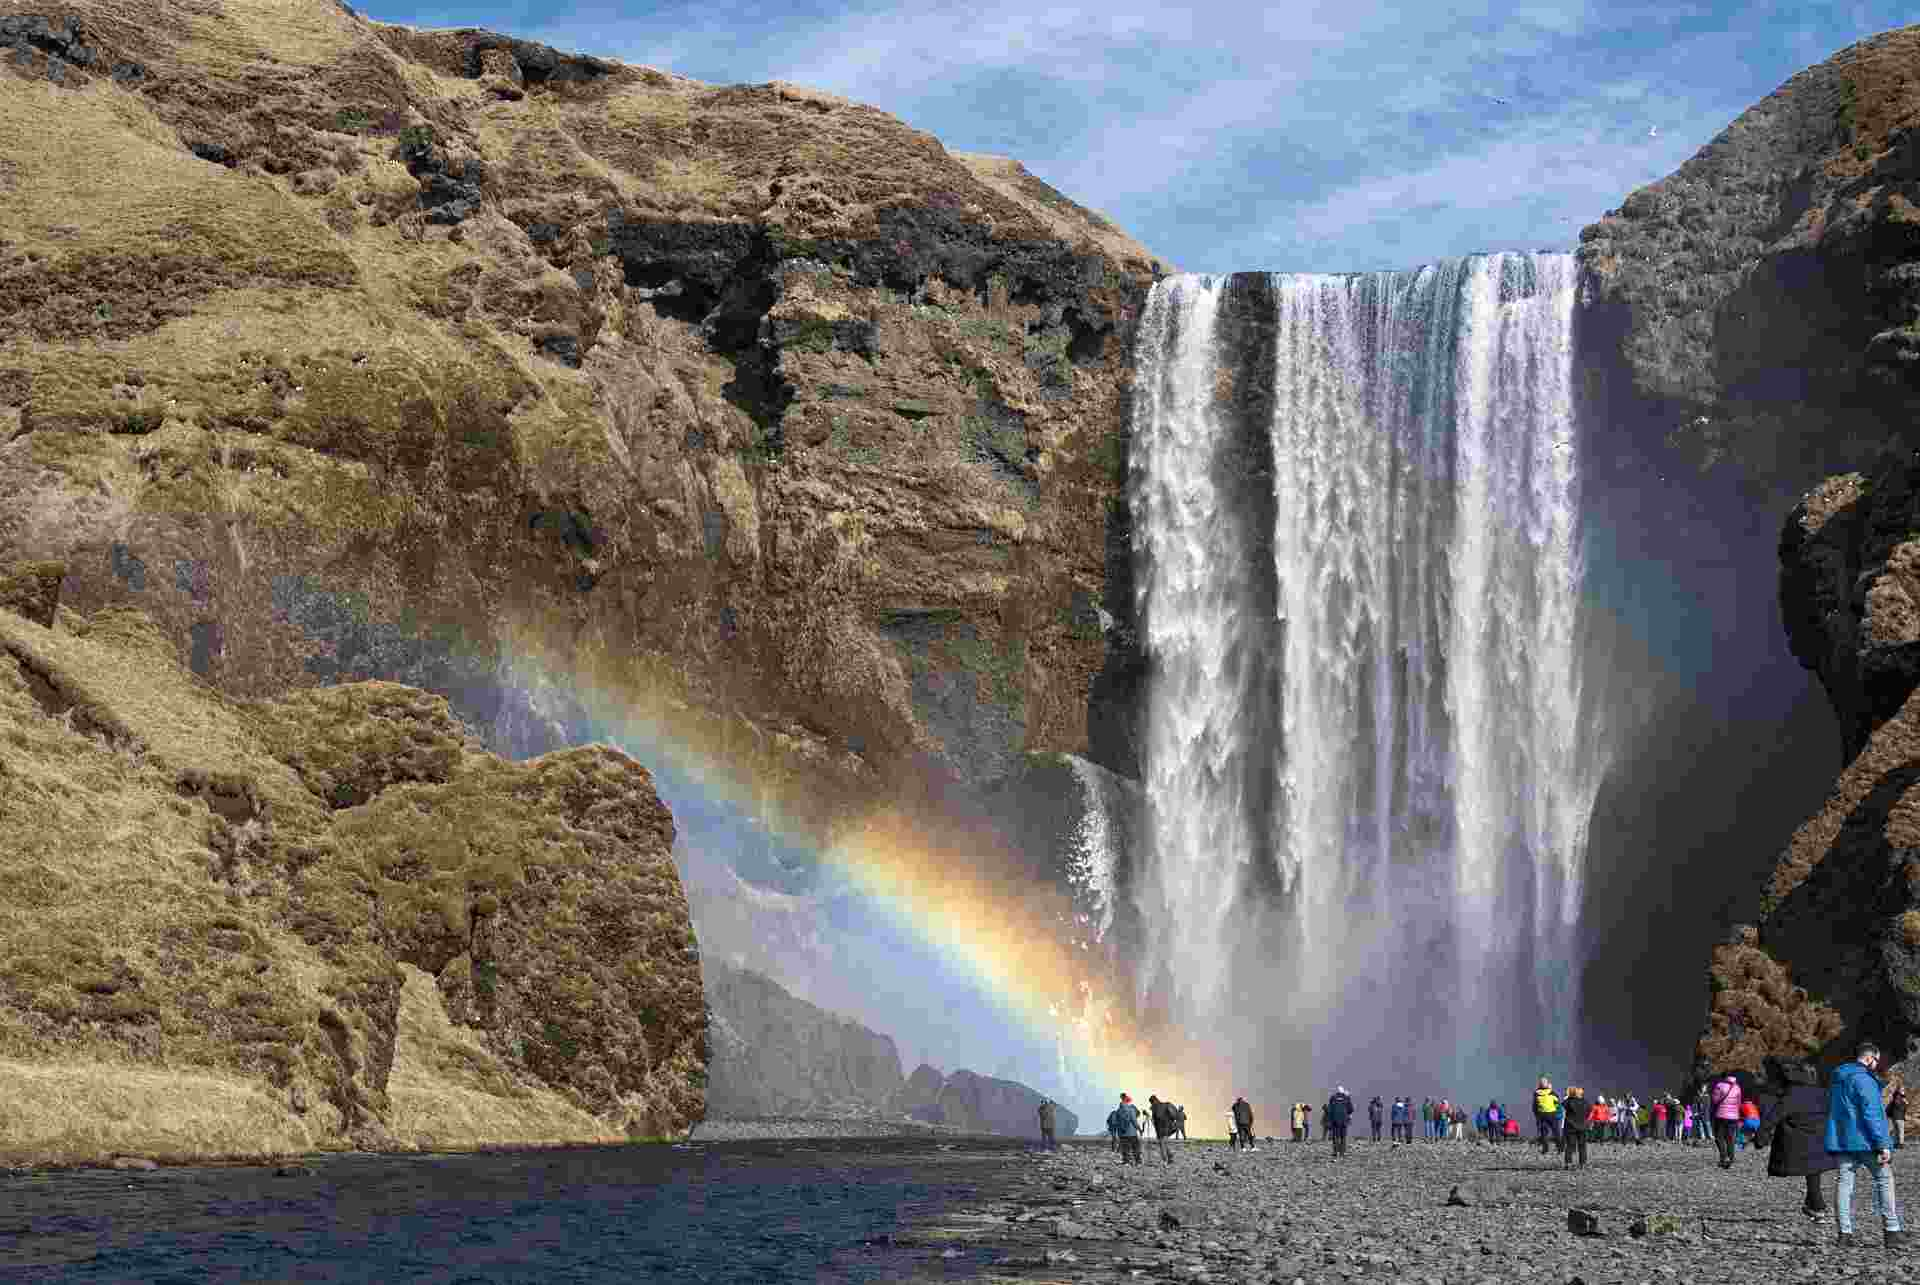 Take A Solo Trip to Iceland